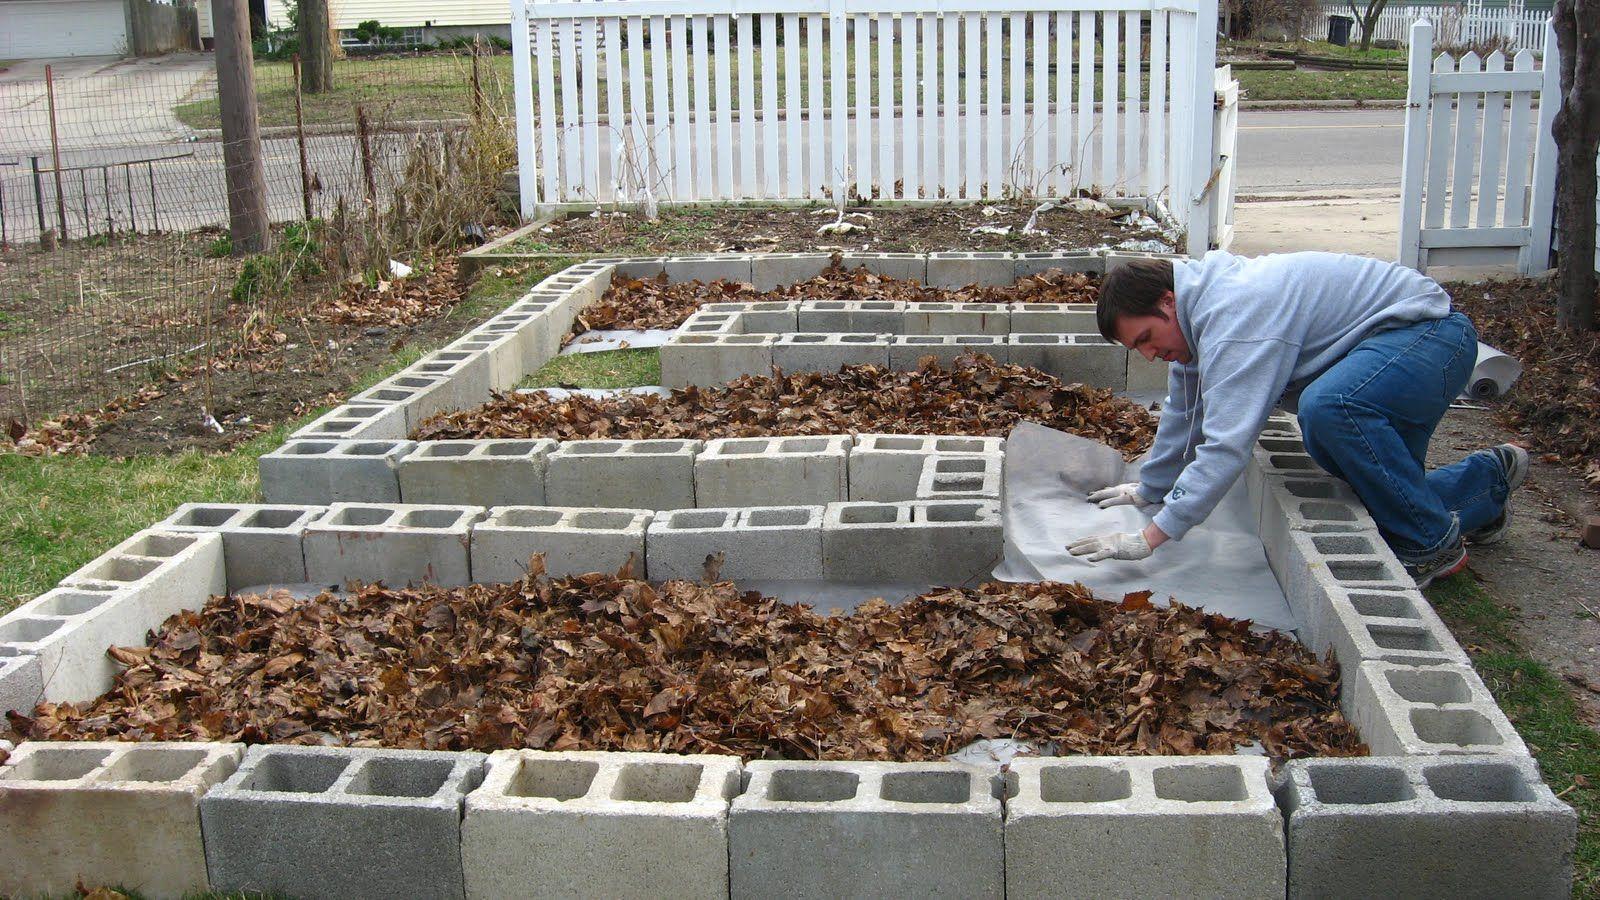 Diy Cinder Block Raised Garden Bed 20 Diy Raised Garden Bed Diy Raised Garden Raised Herb Garden Backyard Vegetable Gardens